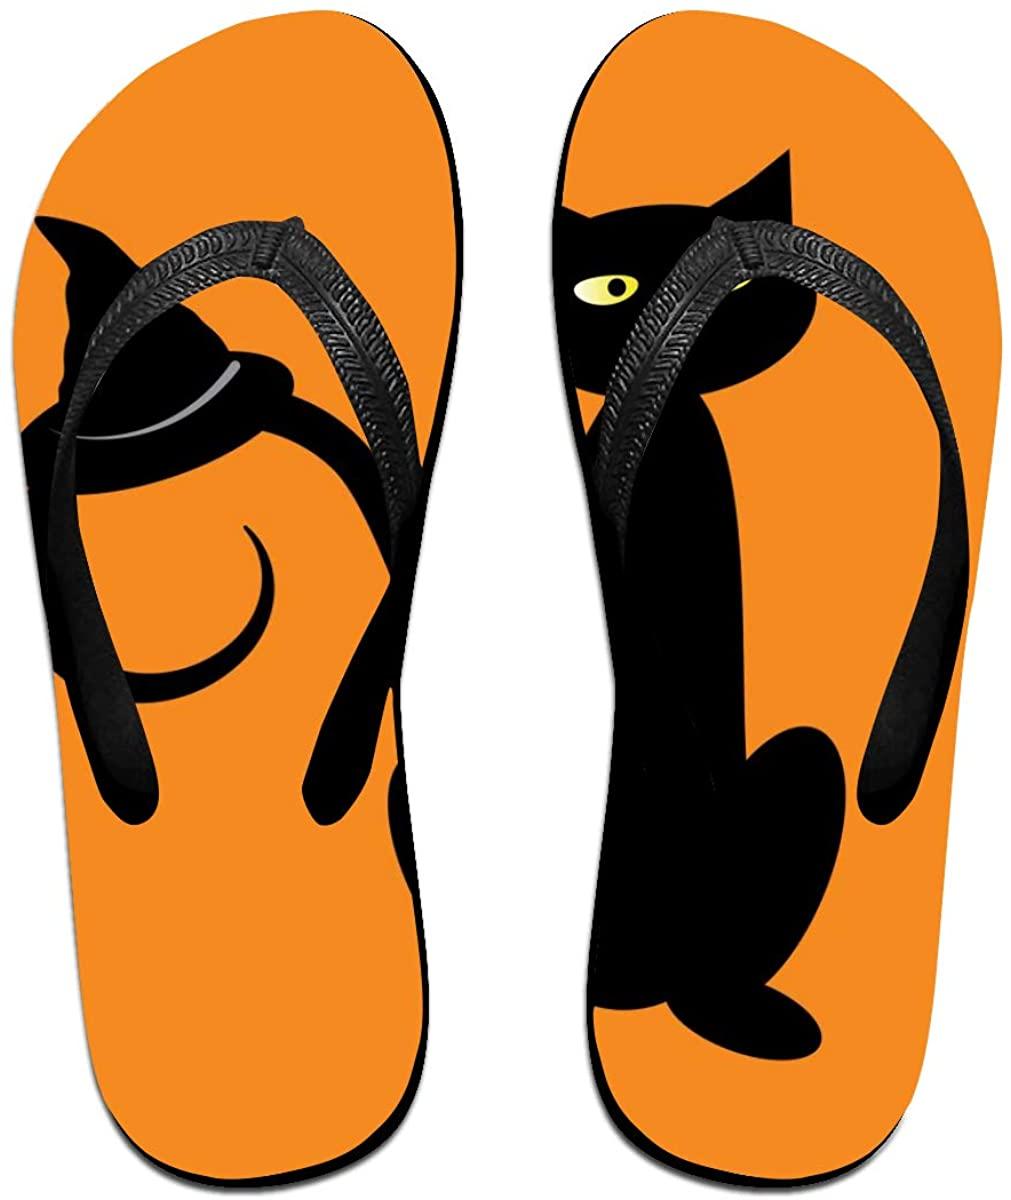 Mens Flip Flop Slippers Black Halloween Cat with Witch Hat,Orange Rubber Comfy Flip Flops Outdoor Beach Sandals